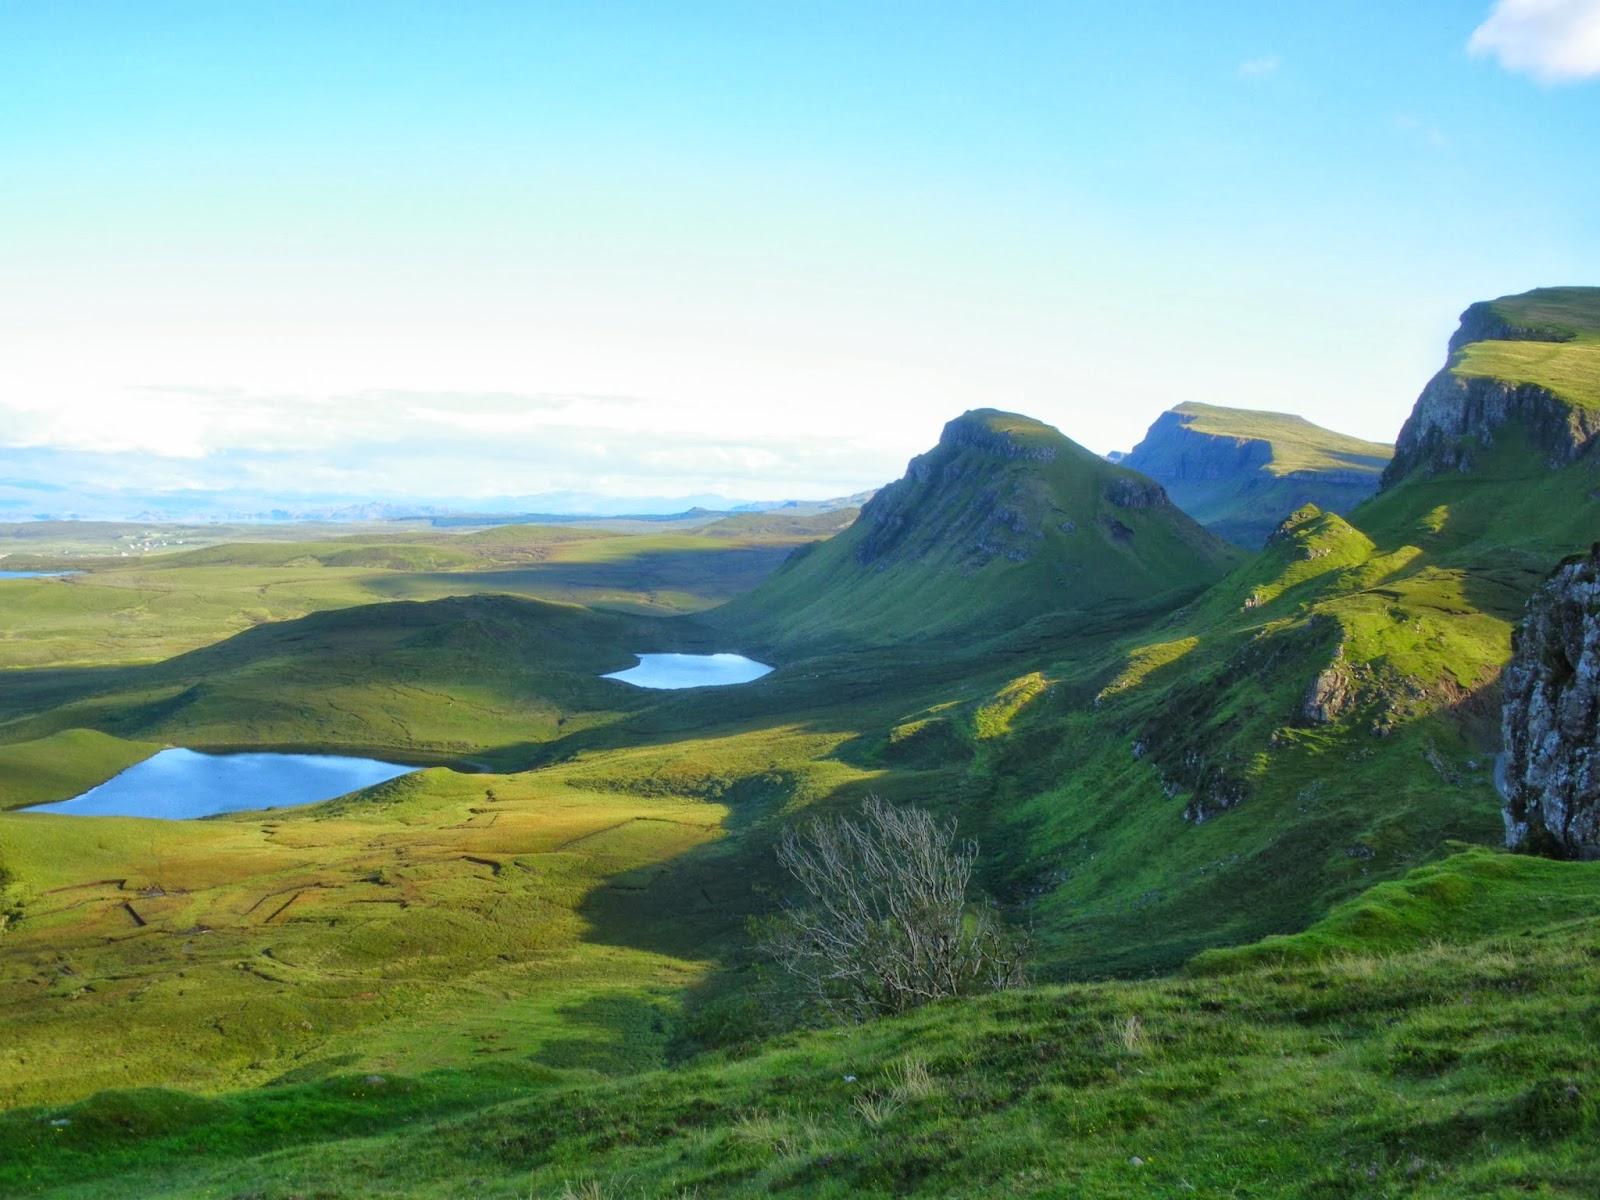 Isle of Skye, Trotternish, Highlands, Scotland, Escocia, United Kingdom, Quiraing